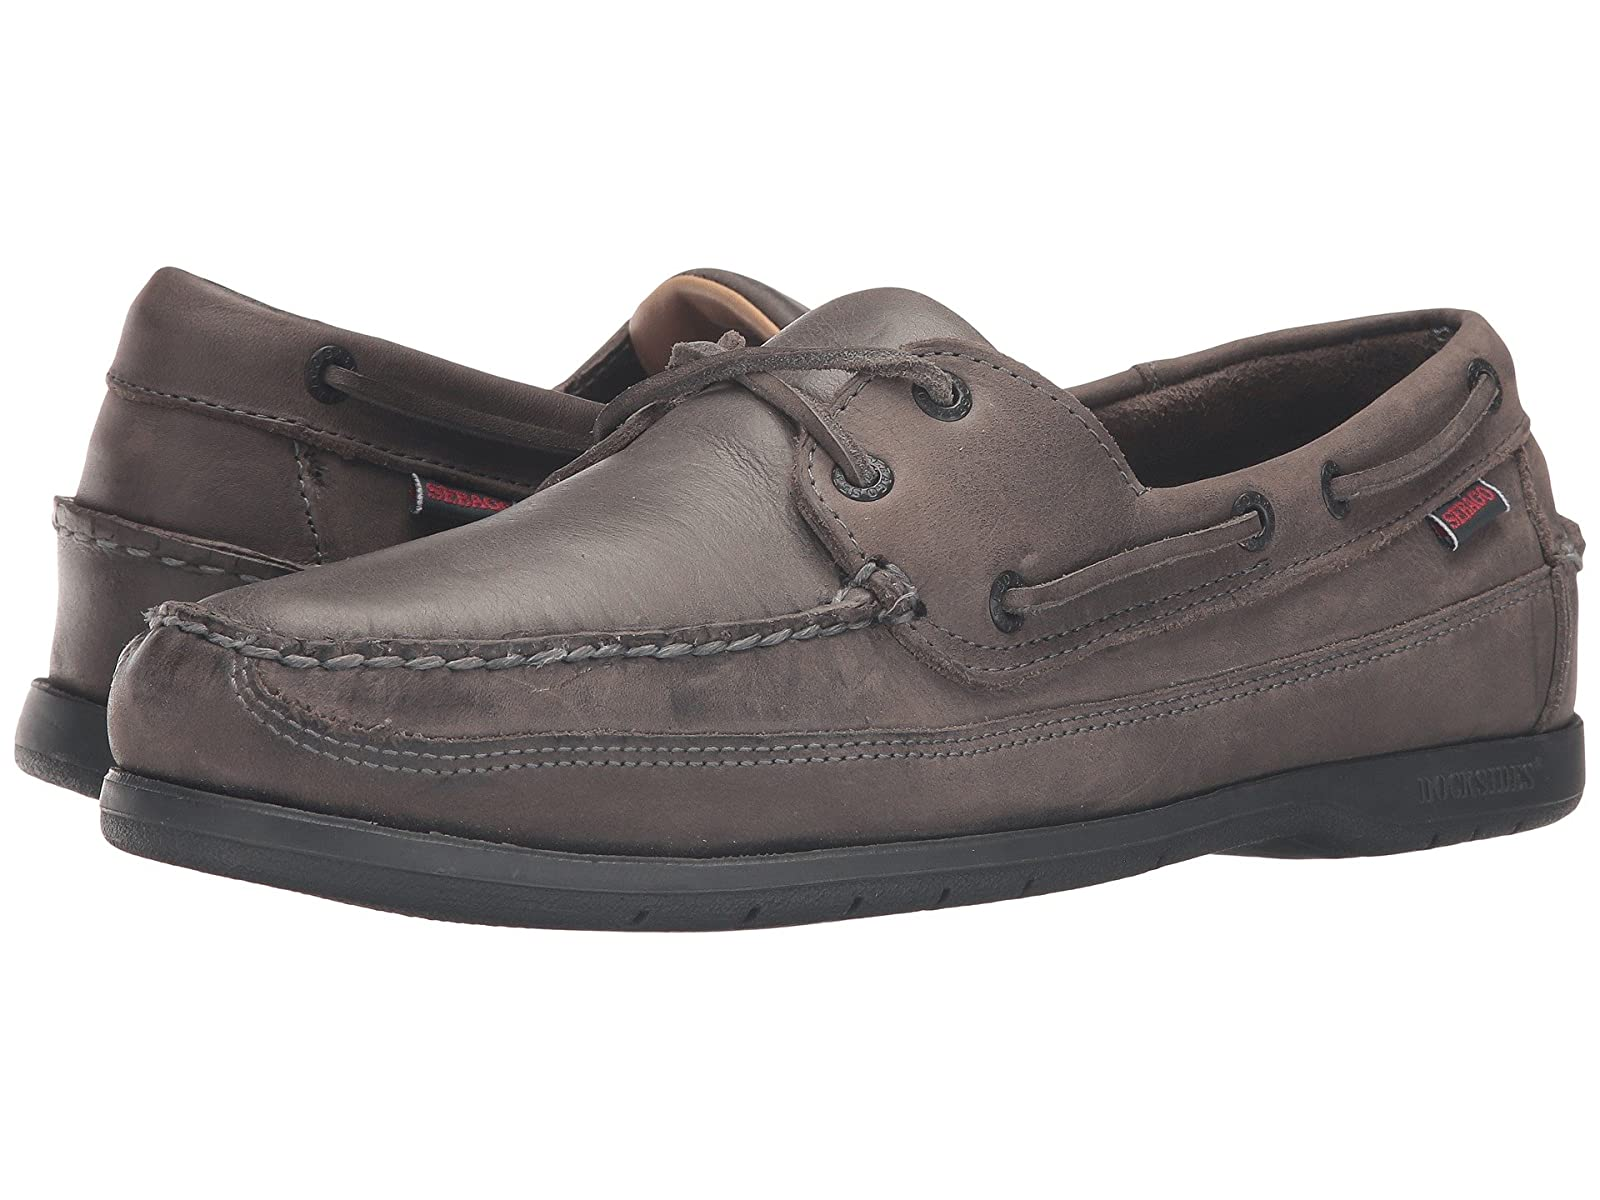 Sebago SchoonerCheap and distinctive eye-catching shoes